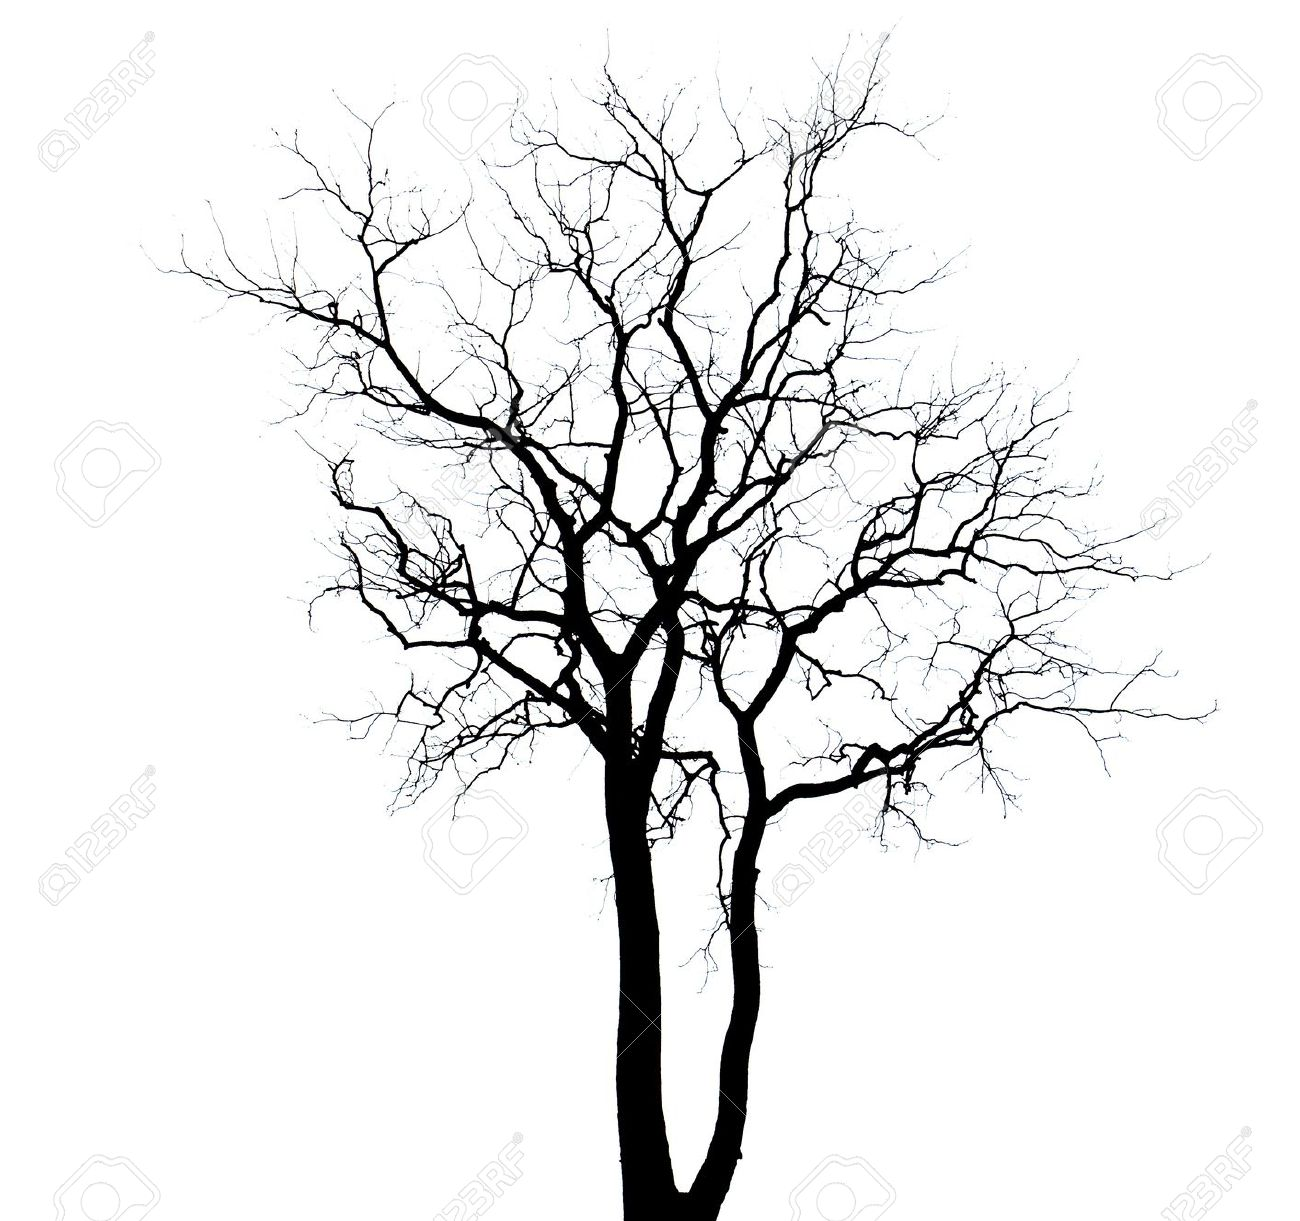 1300x1221 Drawn Dead Tree Silhouette